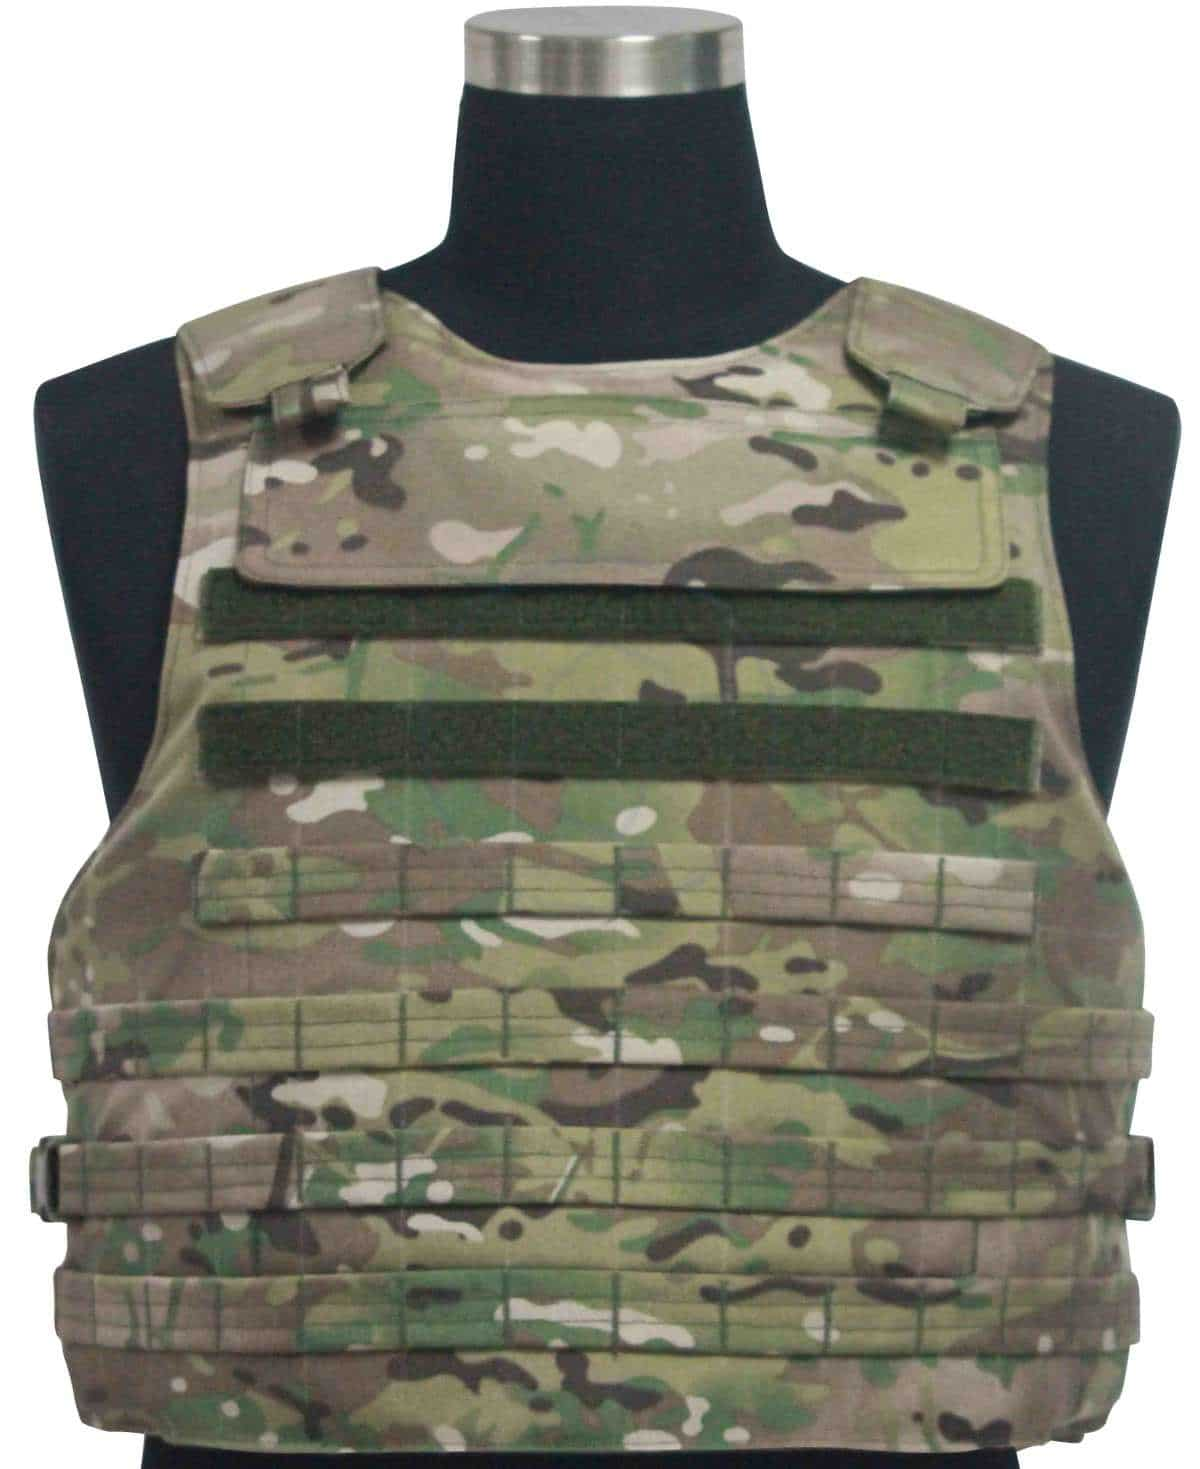 Tactical Vest Plate Carrier (68)